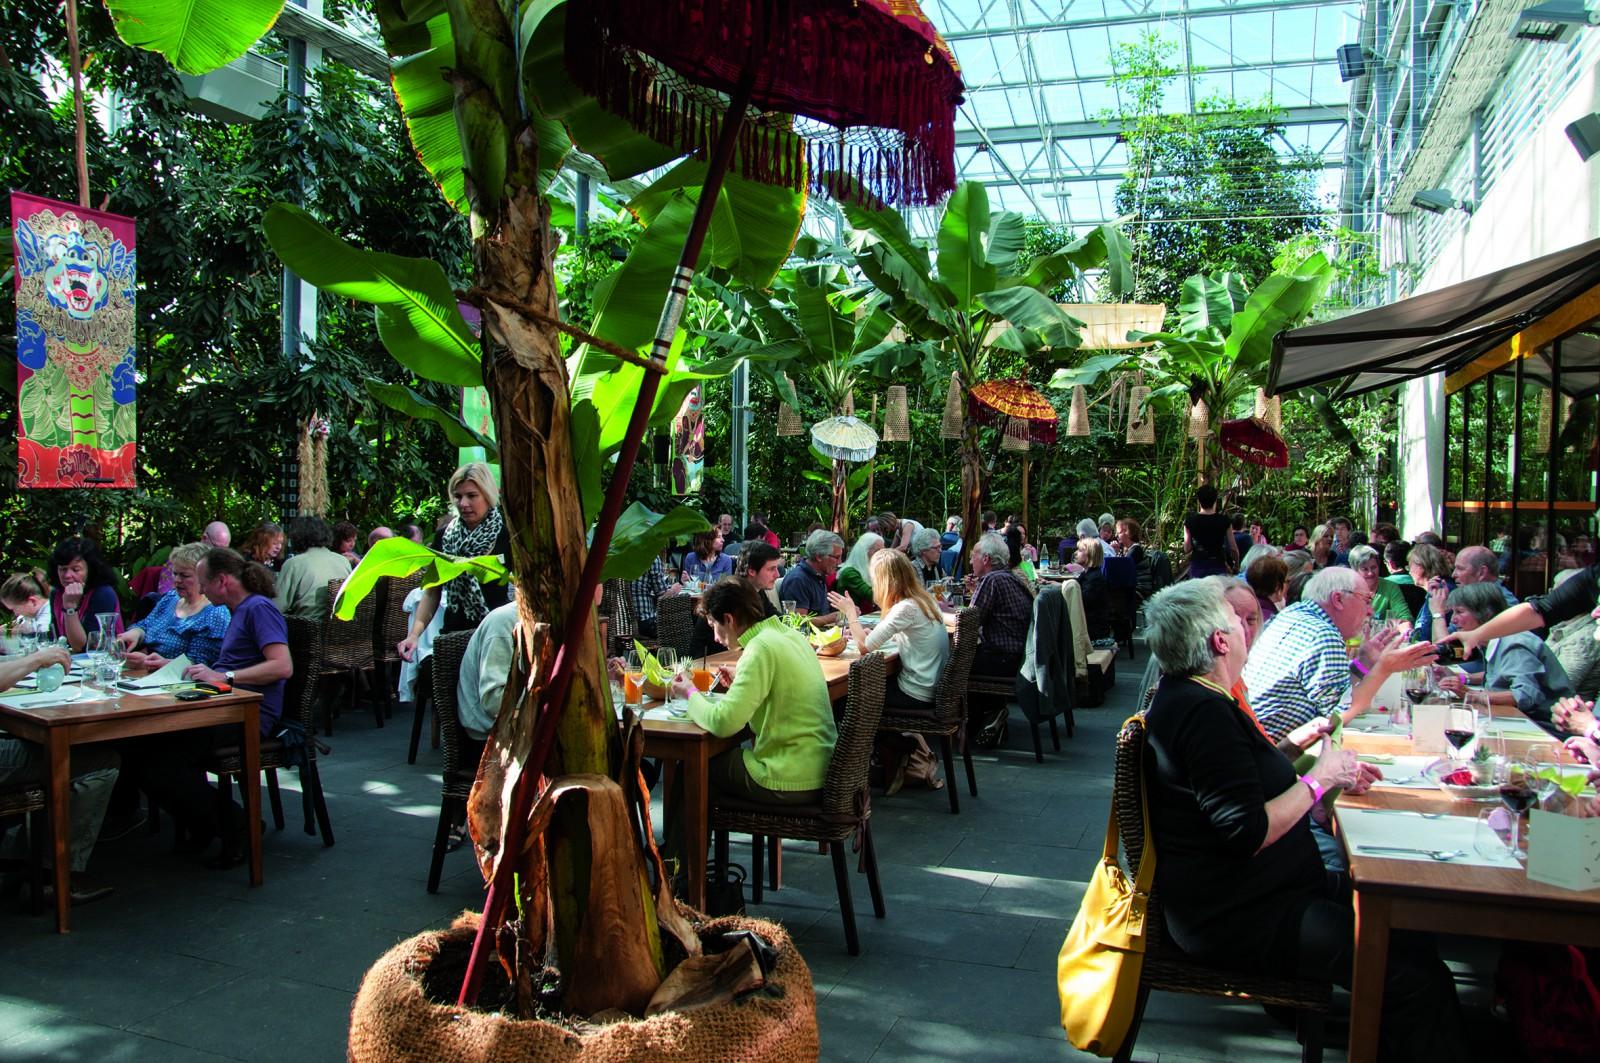 Café restaurant terrasse wolhusen